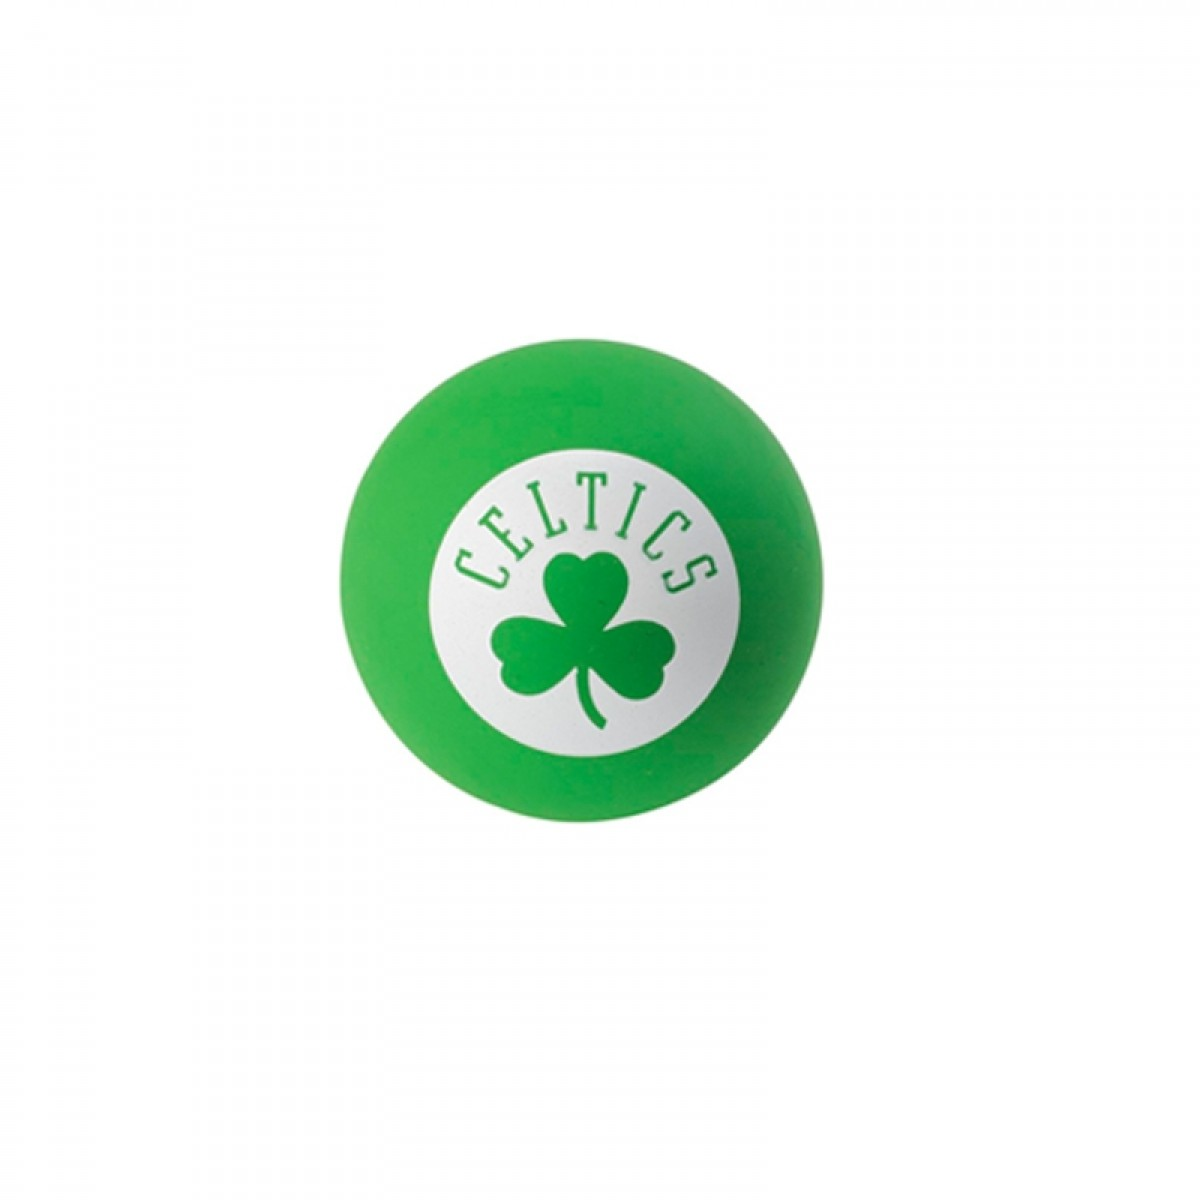 NBA Spaldeens Balls 'Celtics'